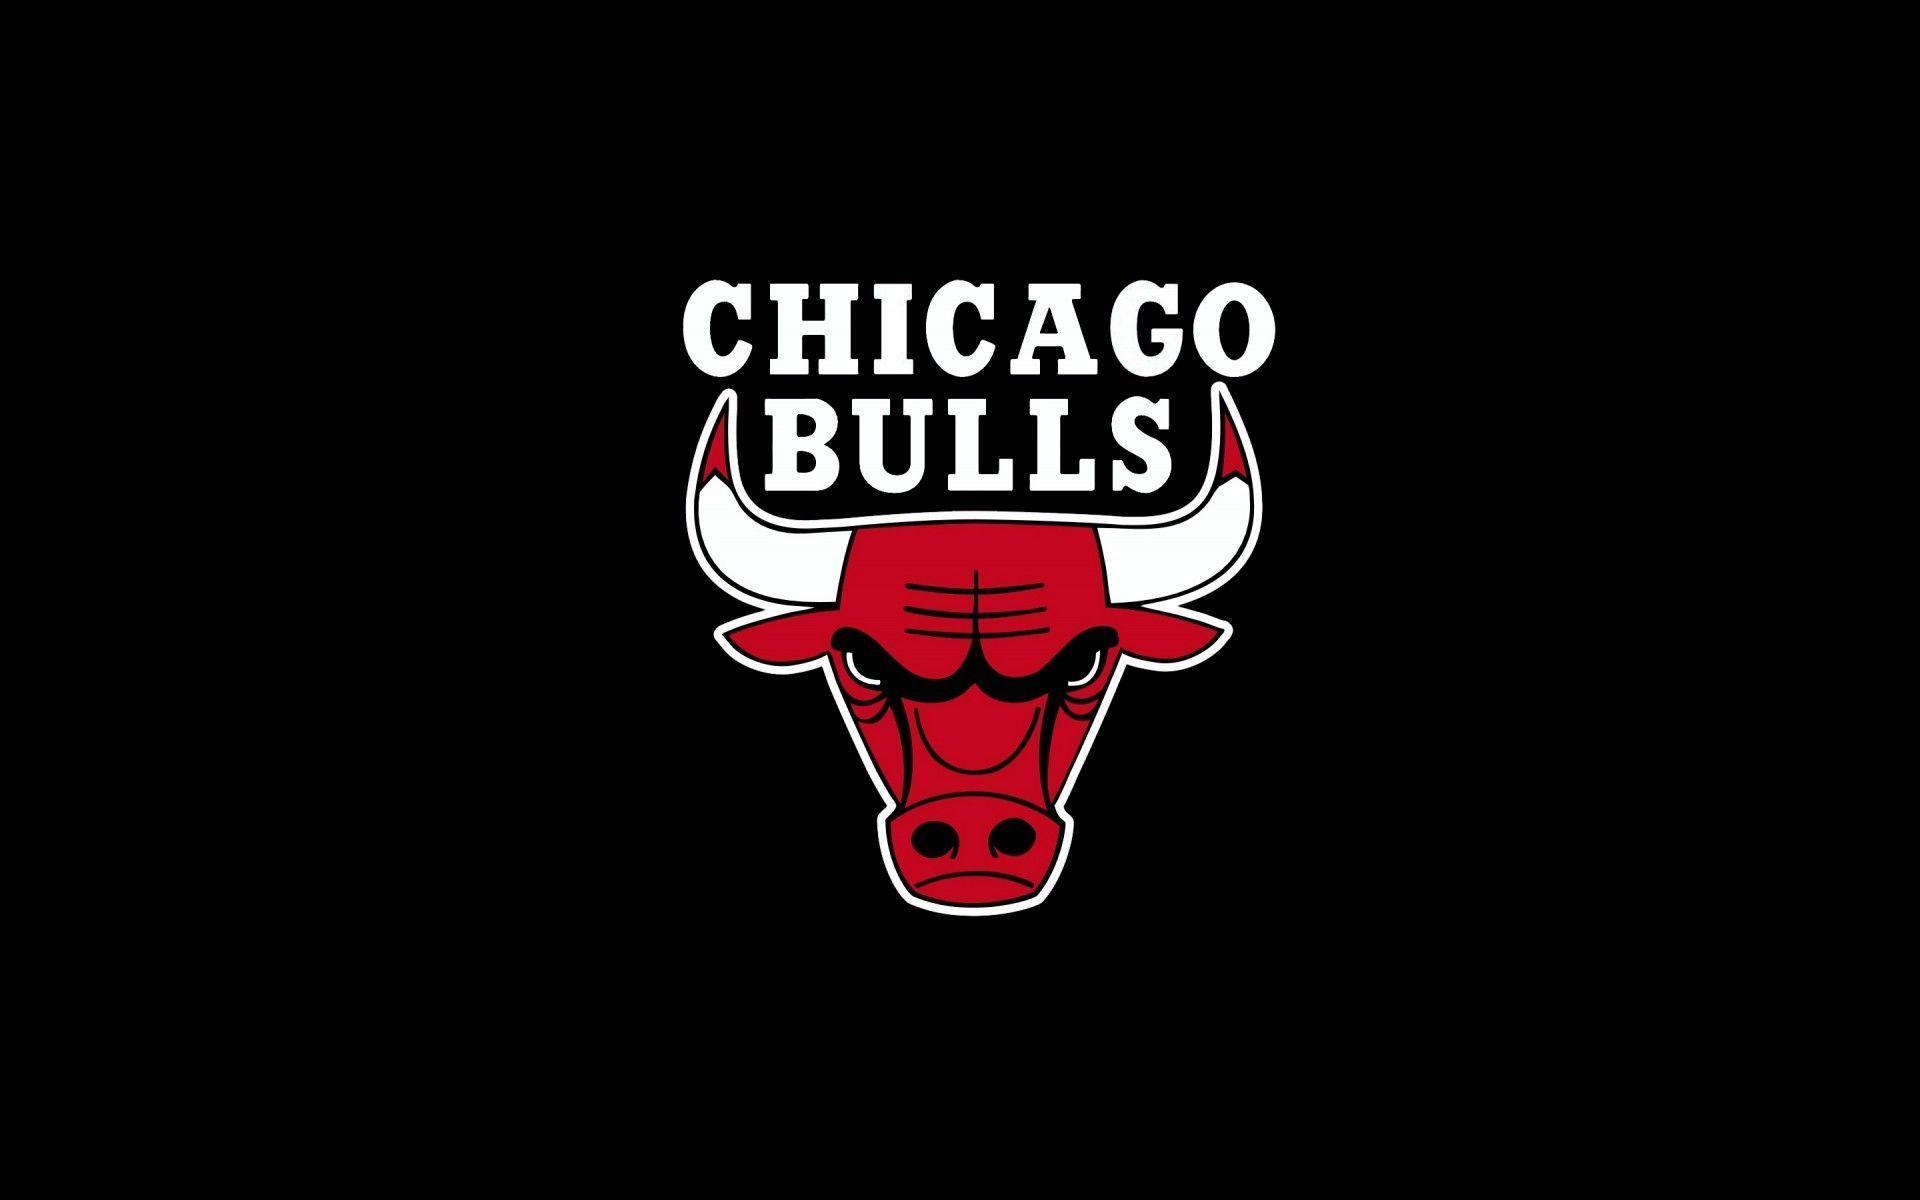 Bulls Logo Wallpapers Top Free Bulls Logo Backgrounds